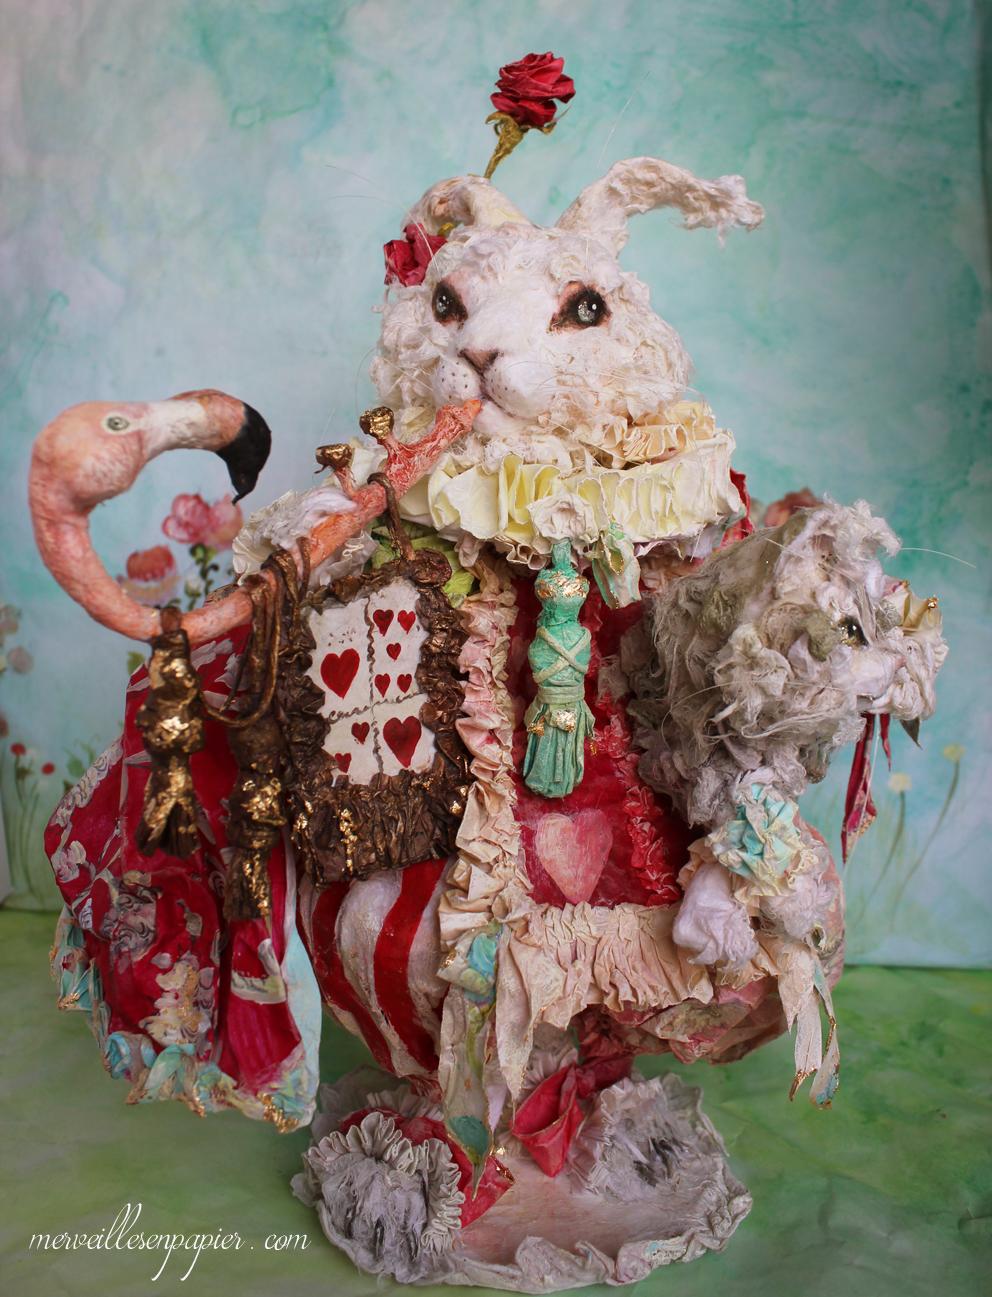 white-rabbit-and-his-trumpet-alice.jpg